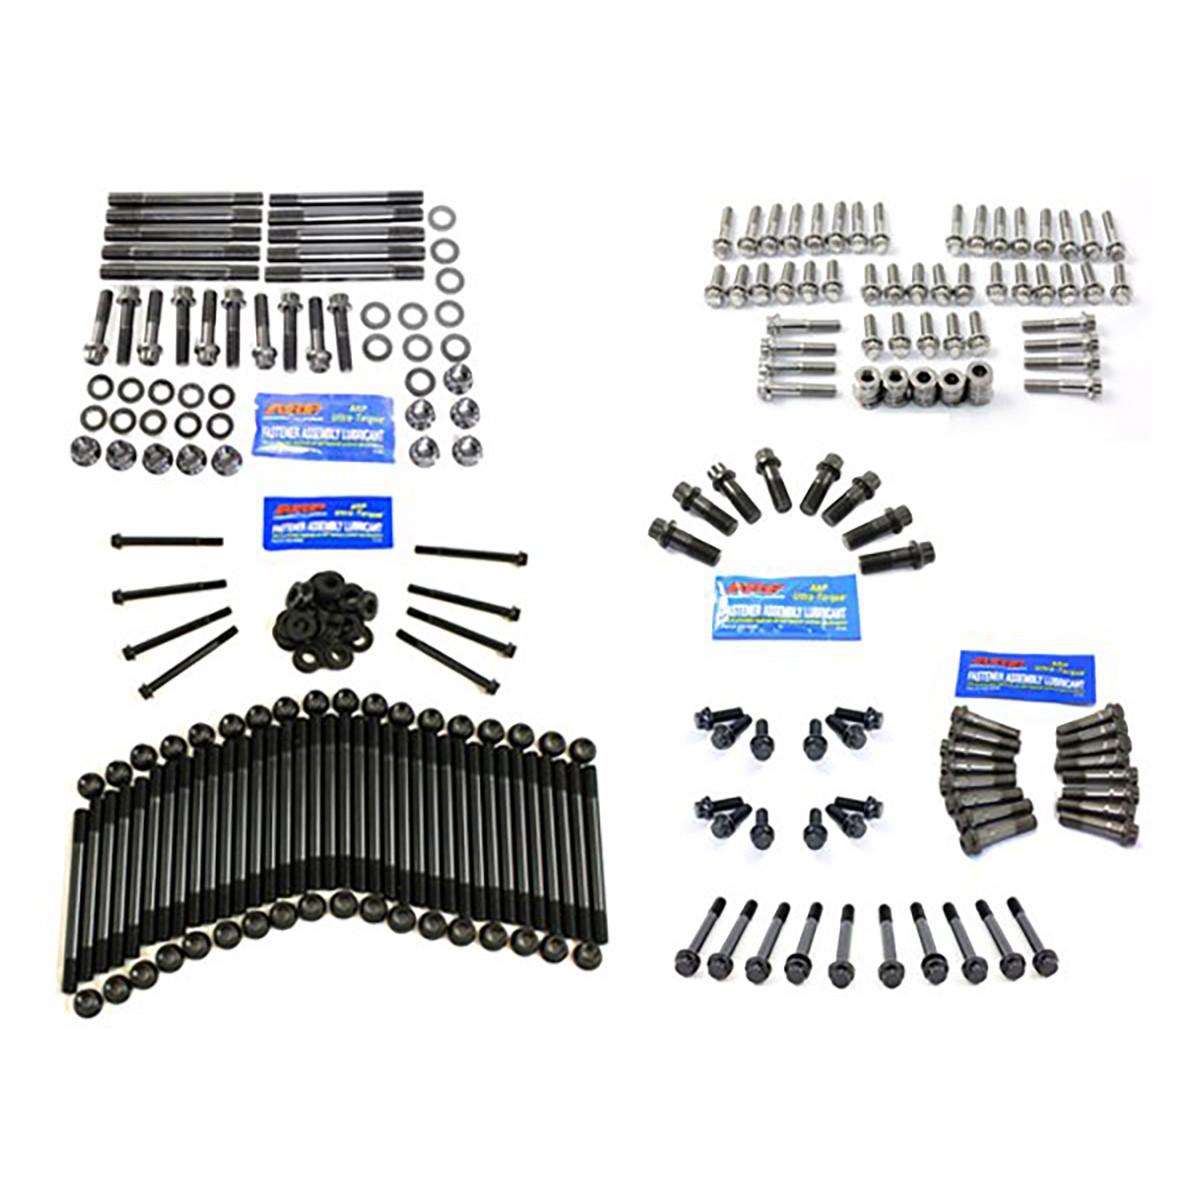 Diesel Auto Power: ARP Engine Hardware Kit, LB7, with